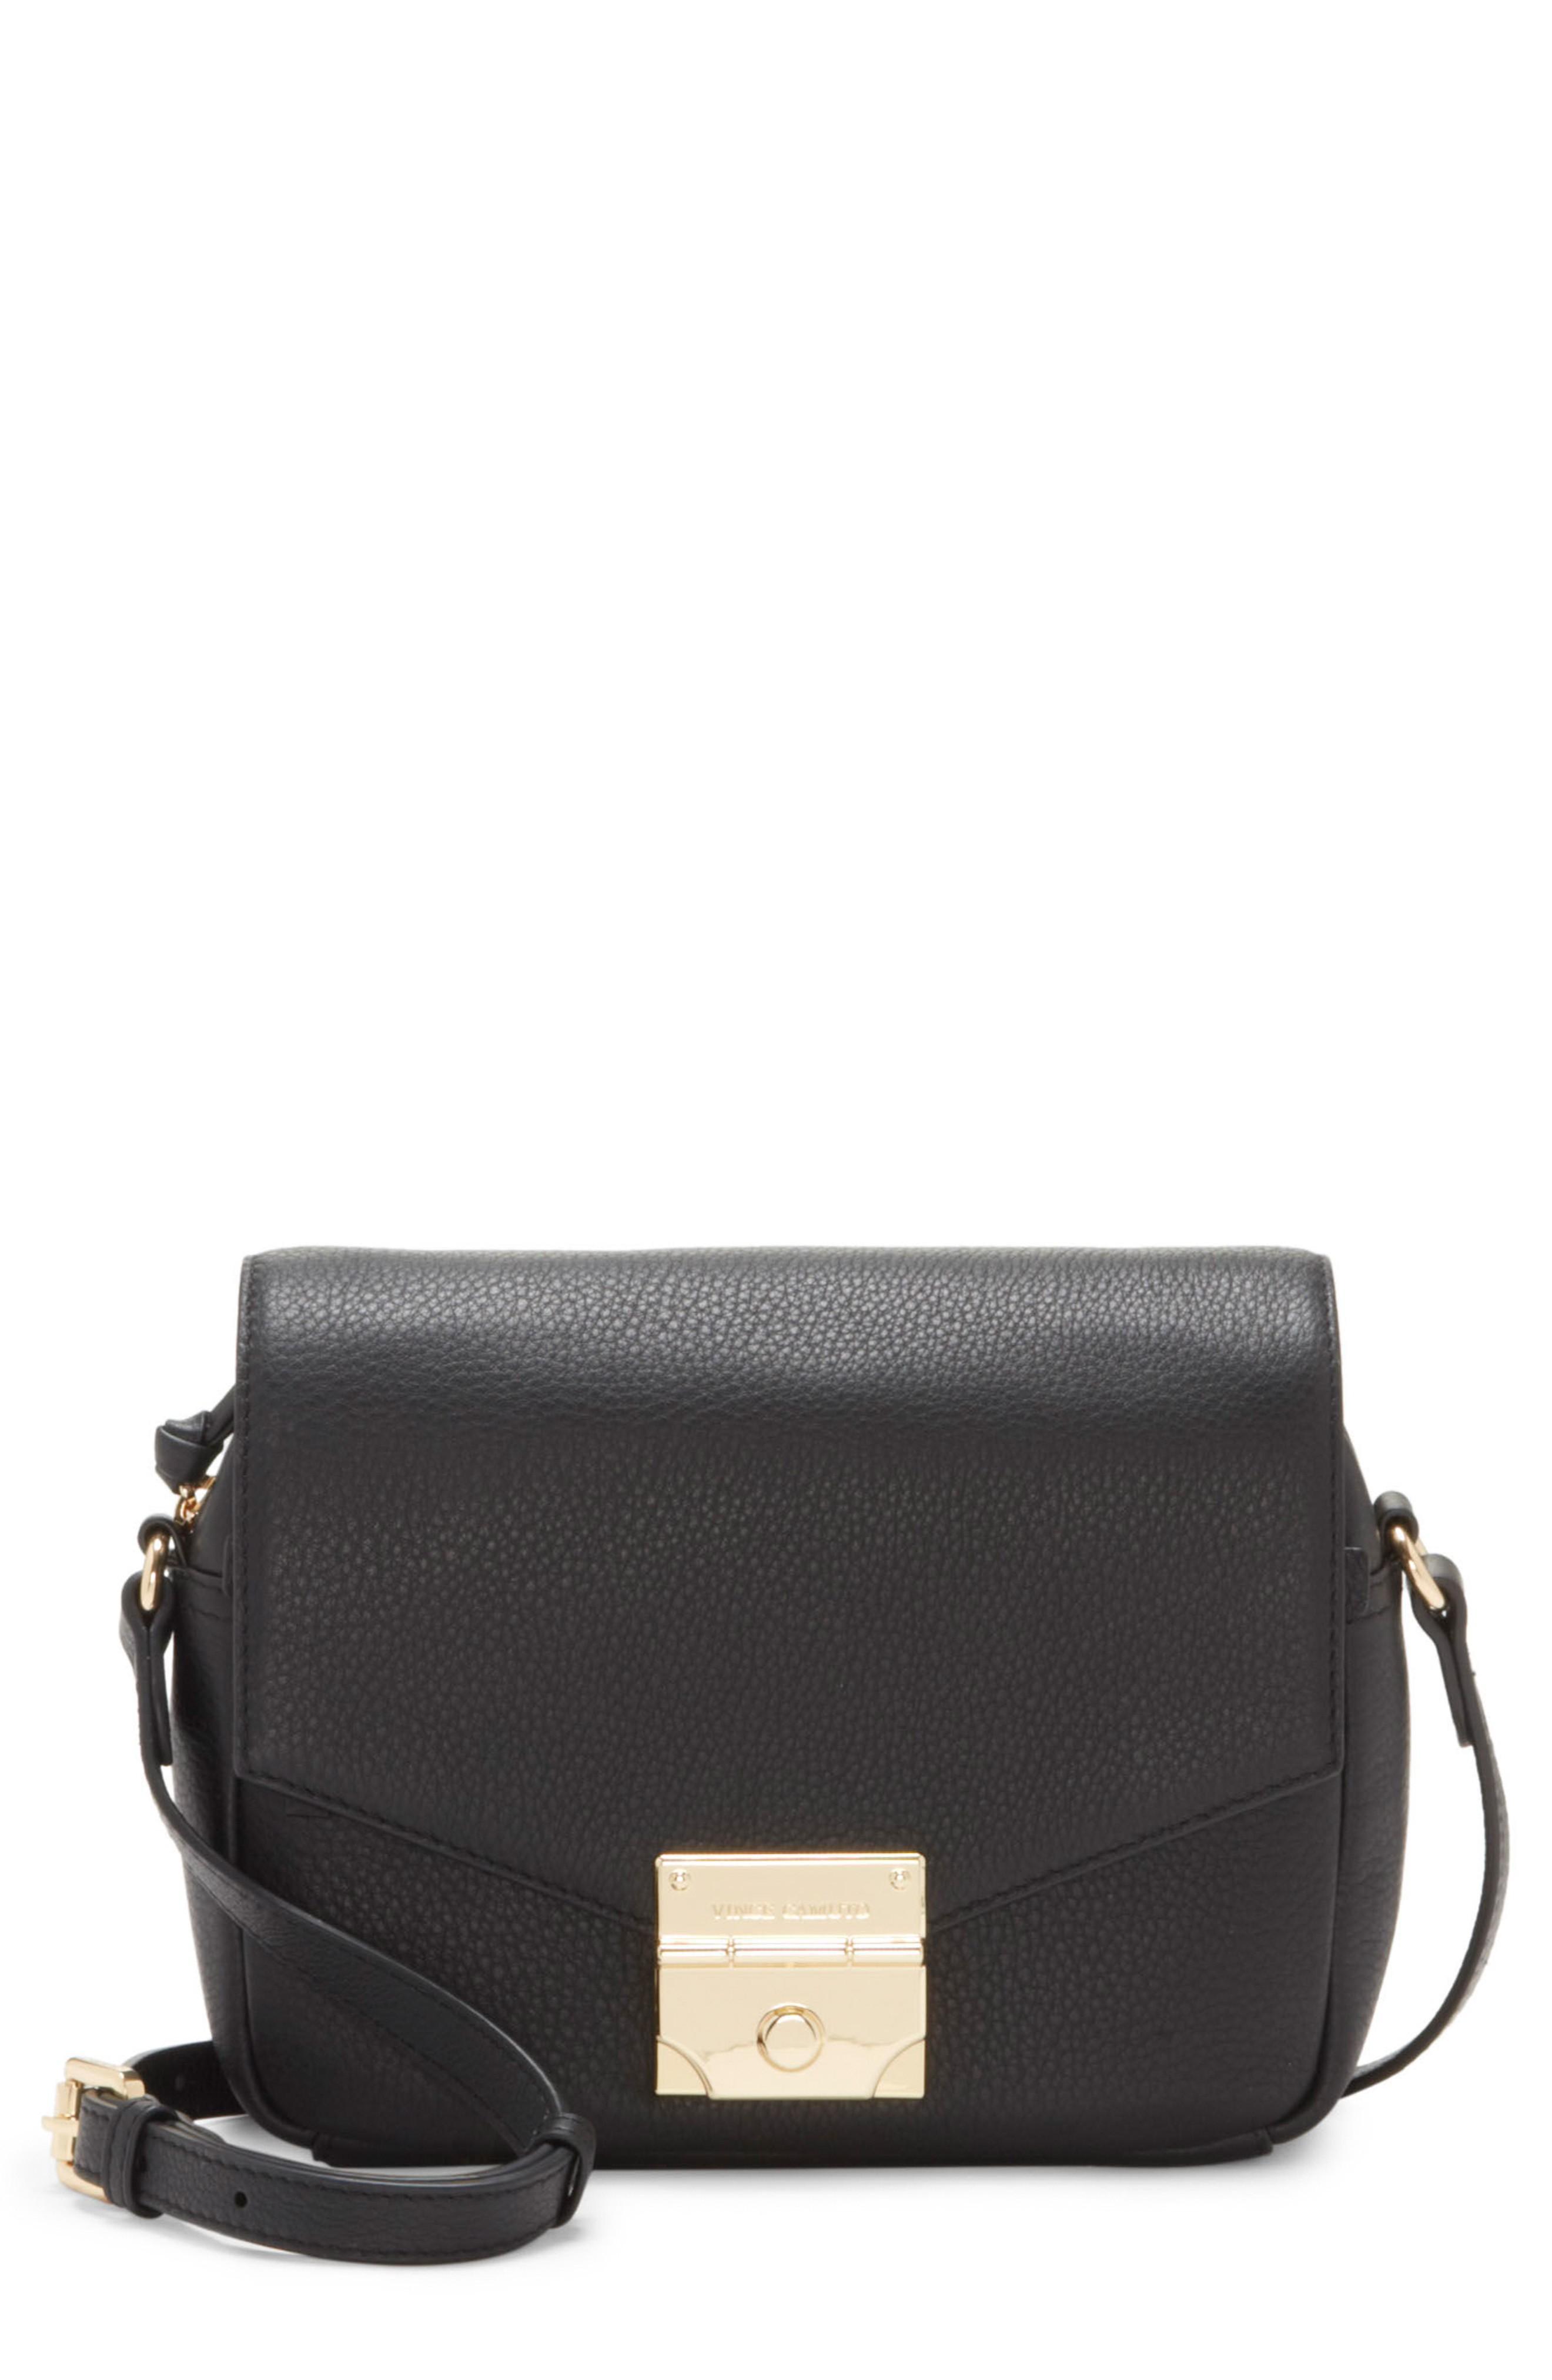 5cfb85a814 Vince Camuto Stina Leather Crossbody Bag - Black